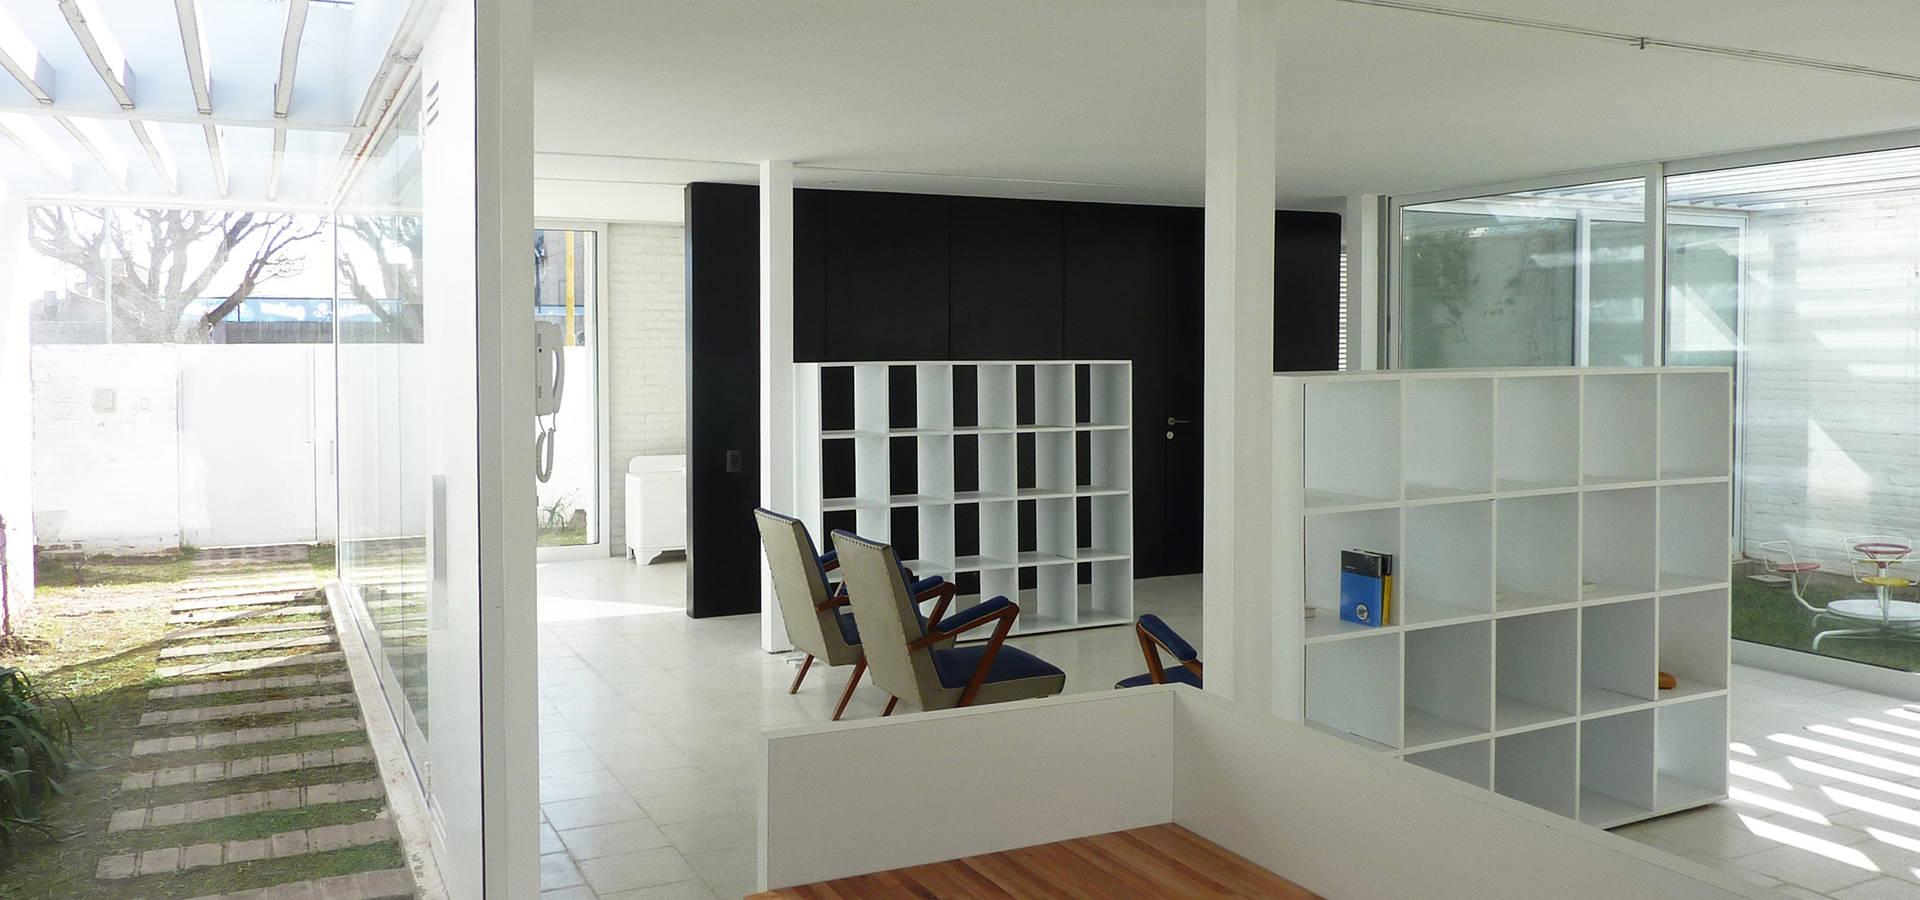 Marcelo Ranzini—Arquitectura